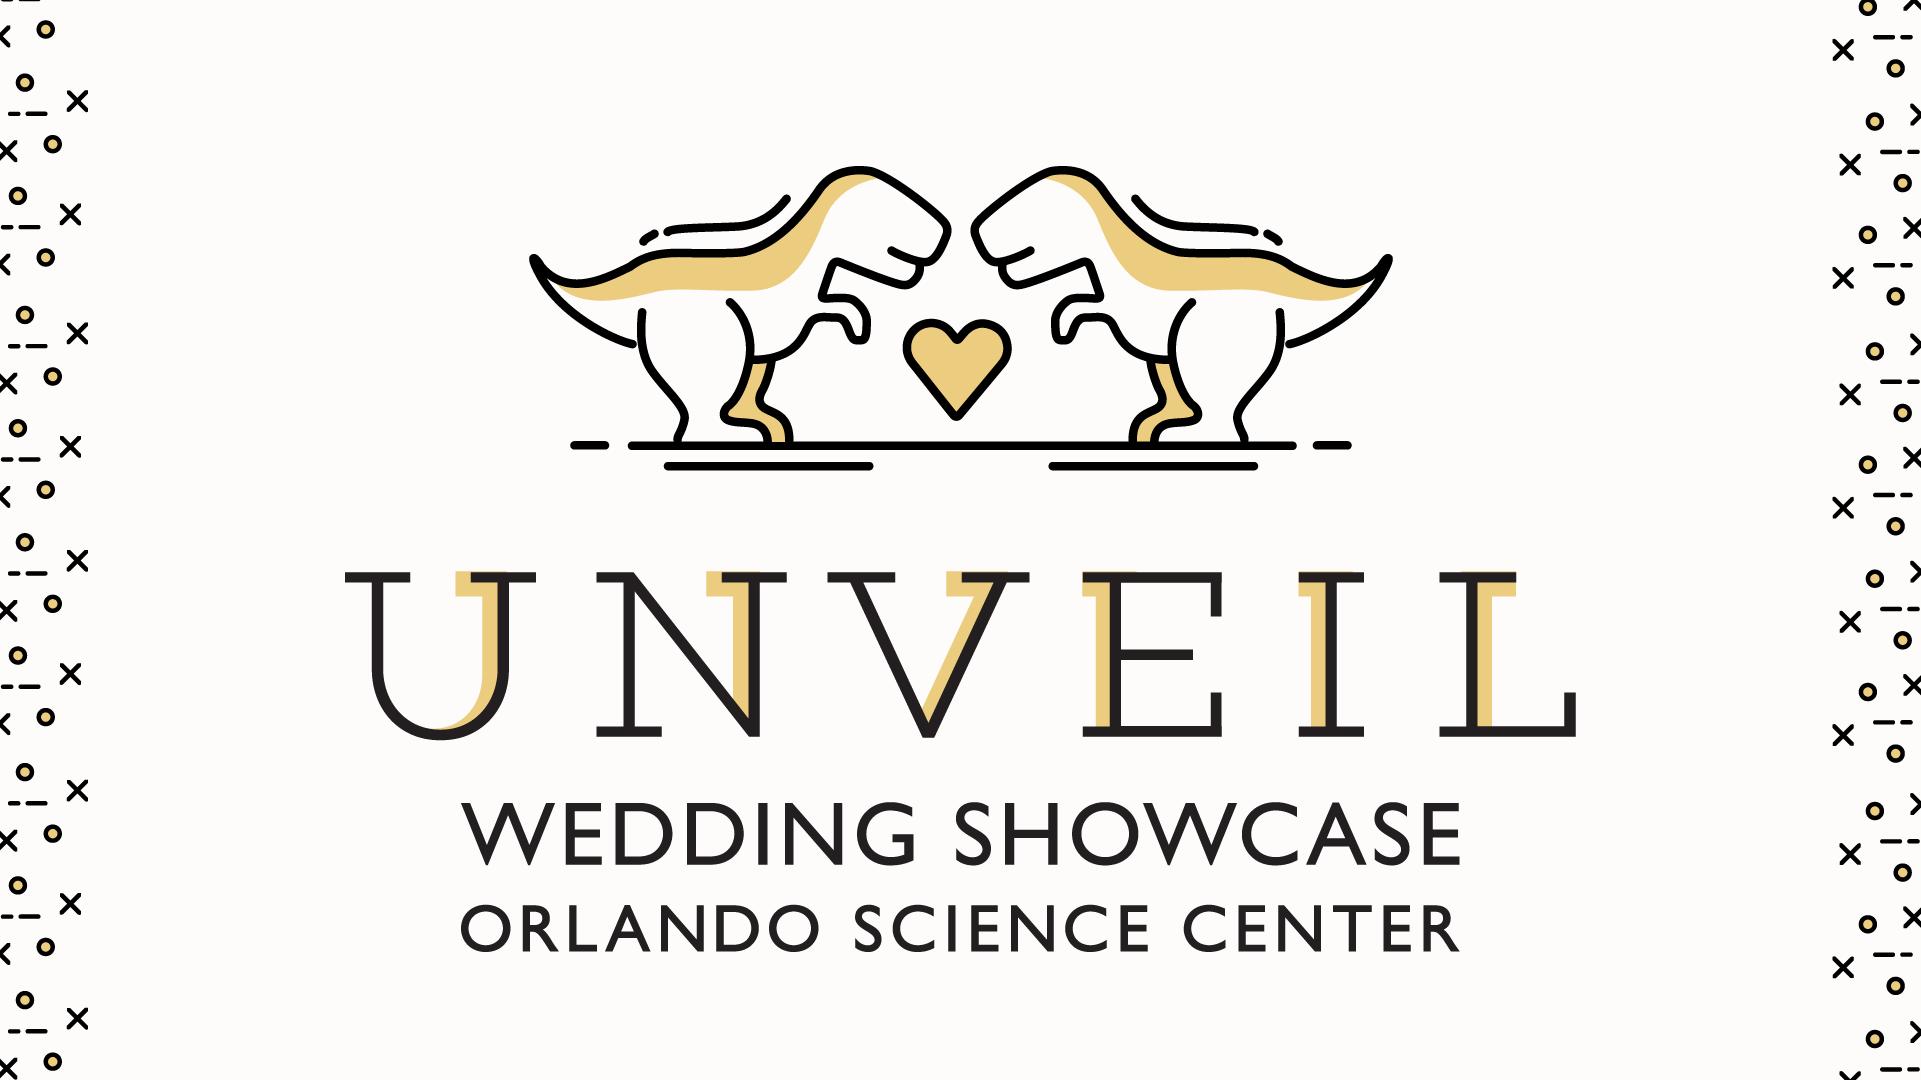 Unveil Central Florida Wedding Showcase